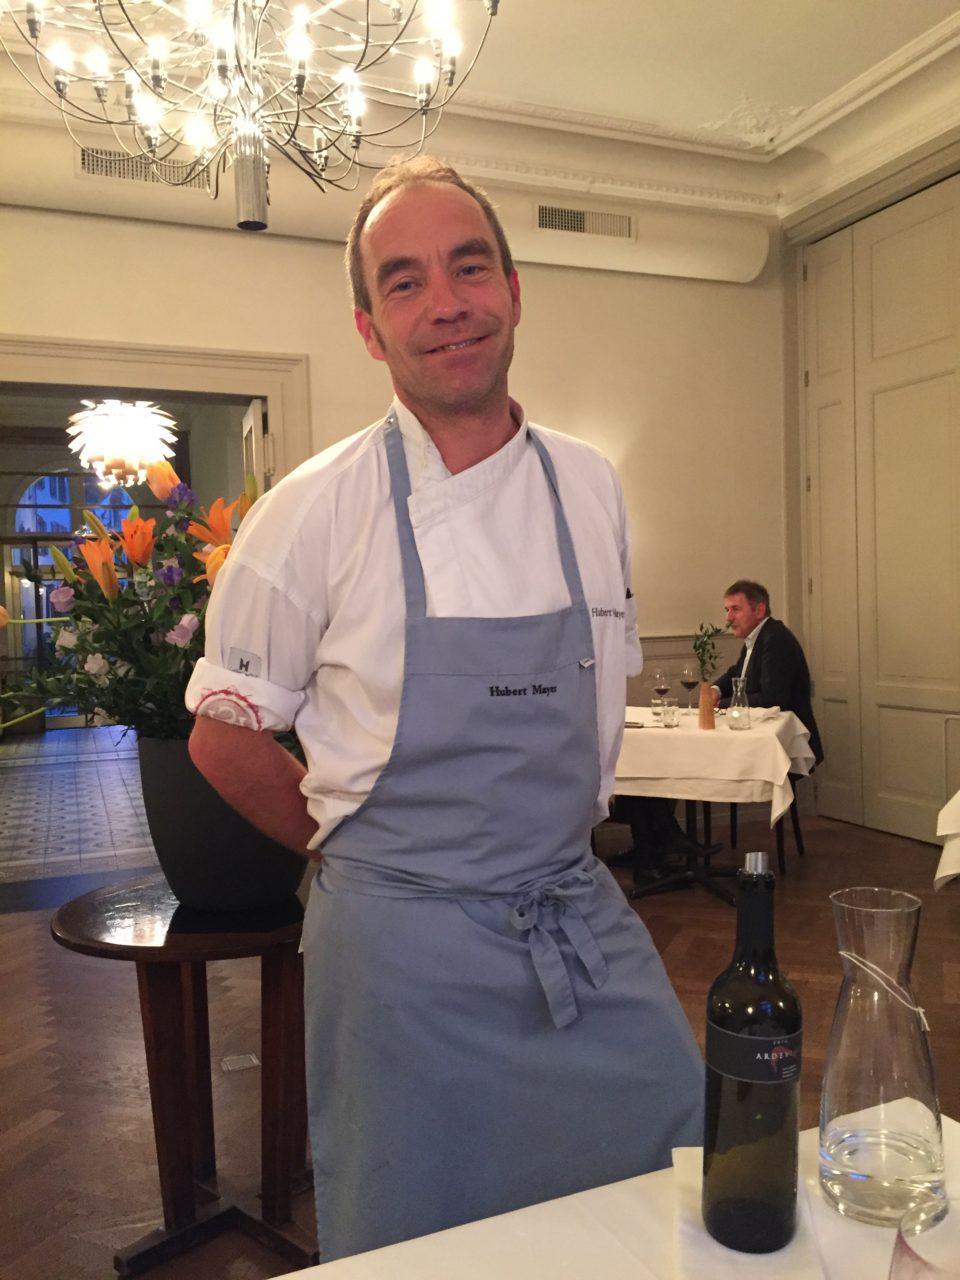 Chef Hubert Mayer of the Hotel Krafft Restaurant in Basel, Switzerland